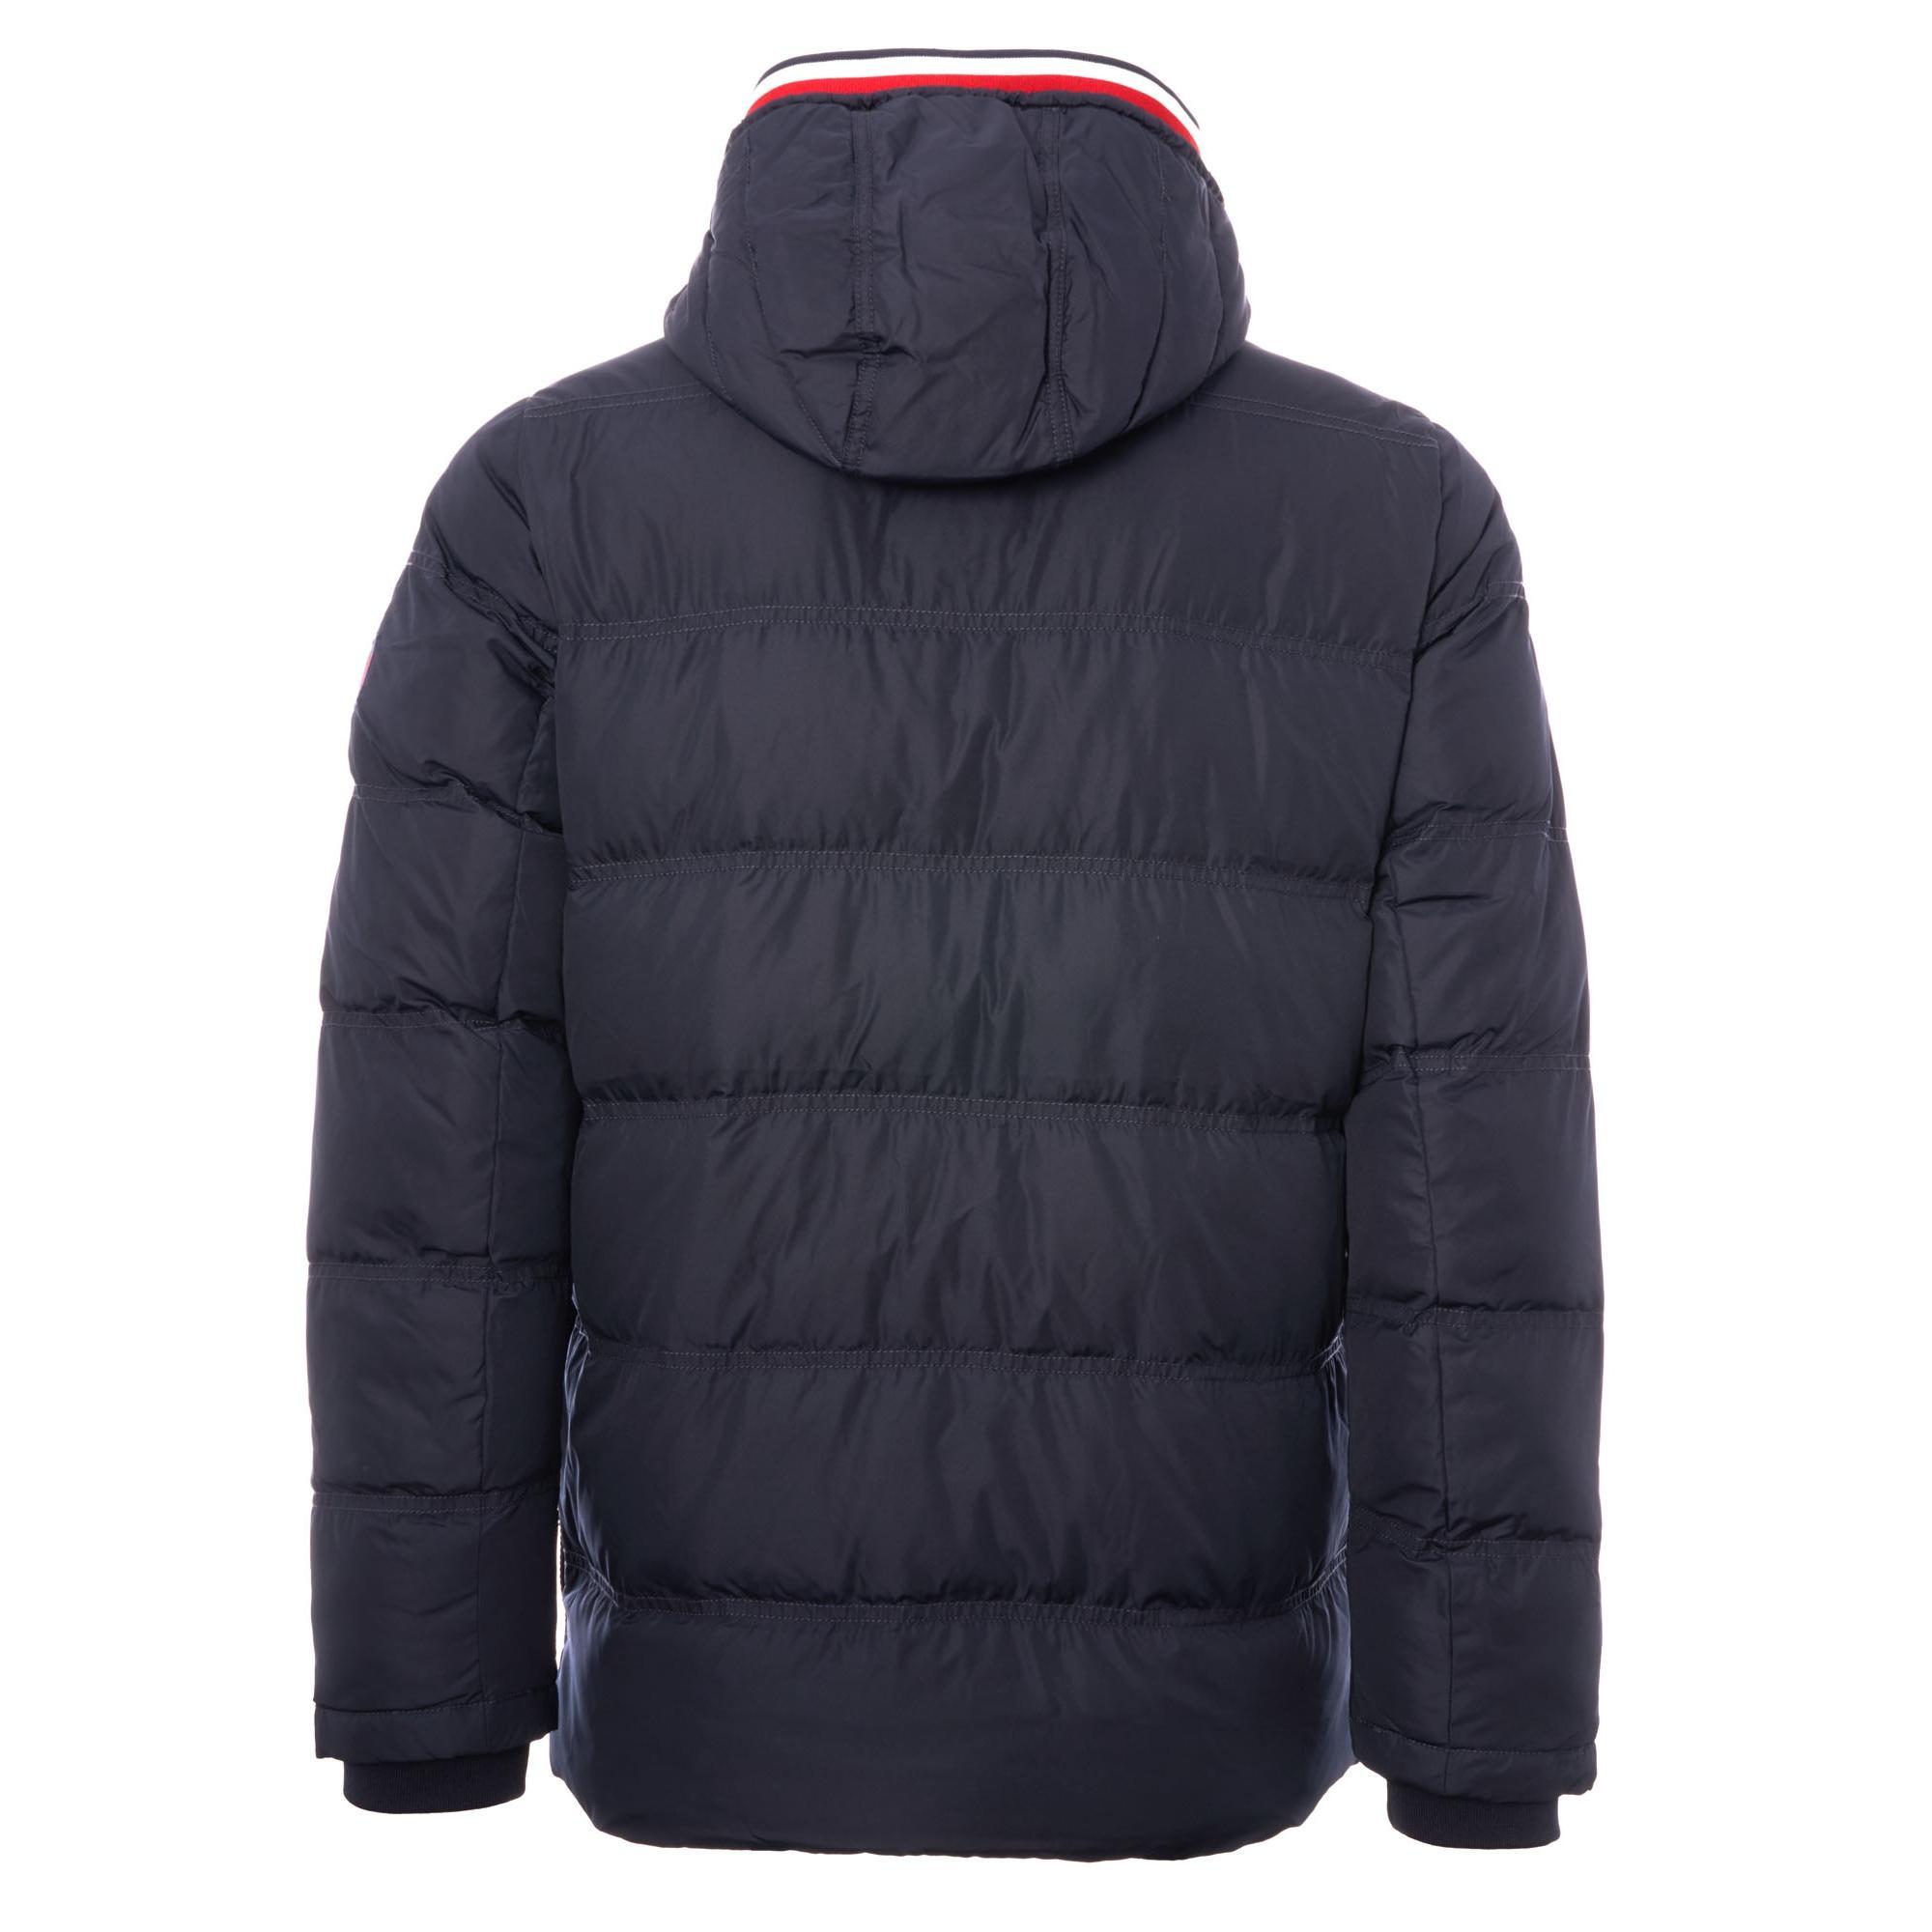 51982419 Lyst - Tommy Hilfiger Hooded Down Jacket - Sky Captain in Blue for Men